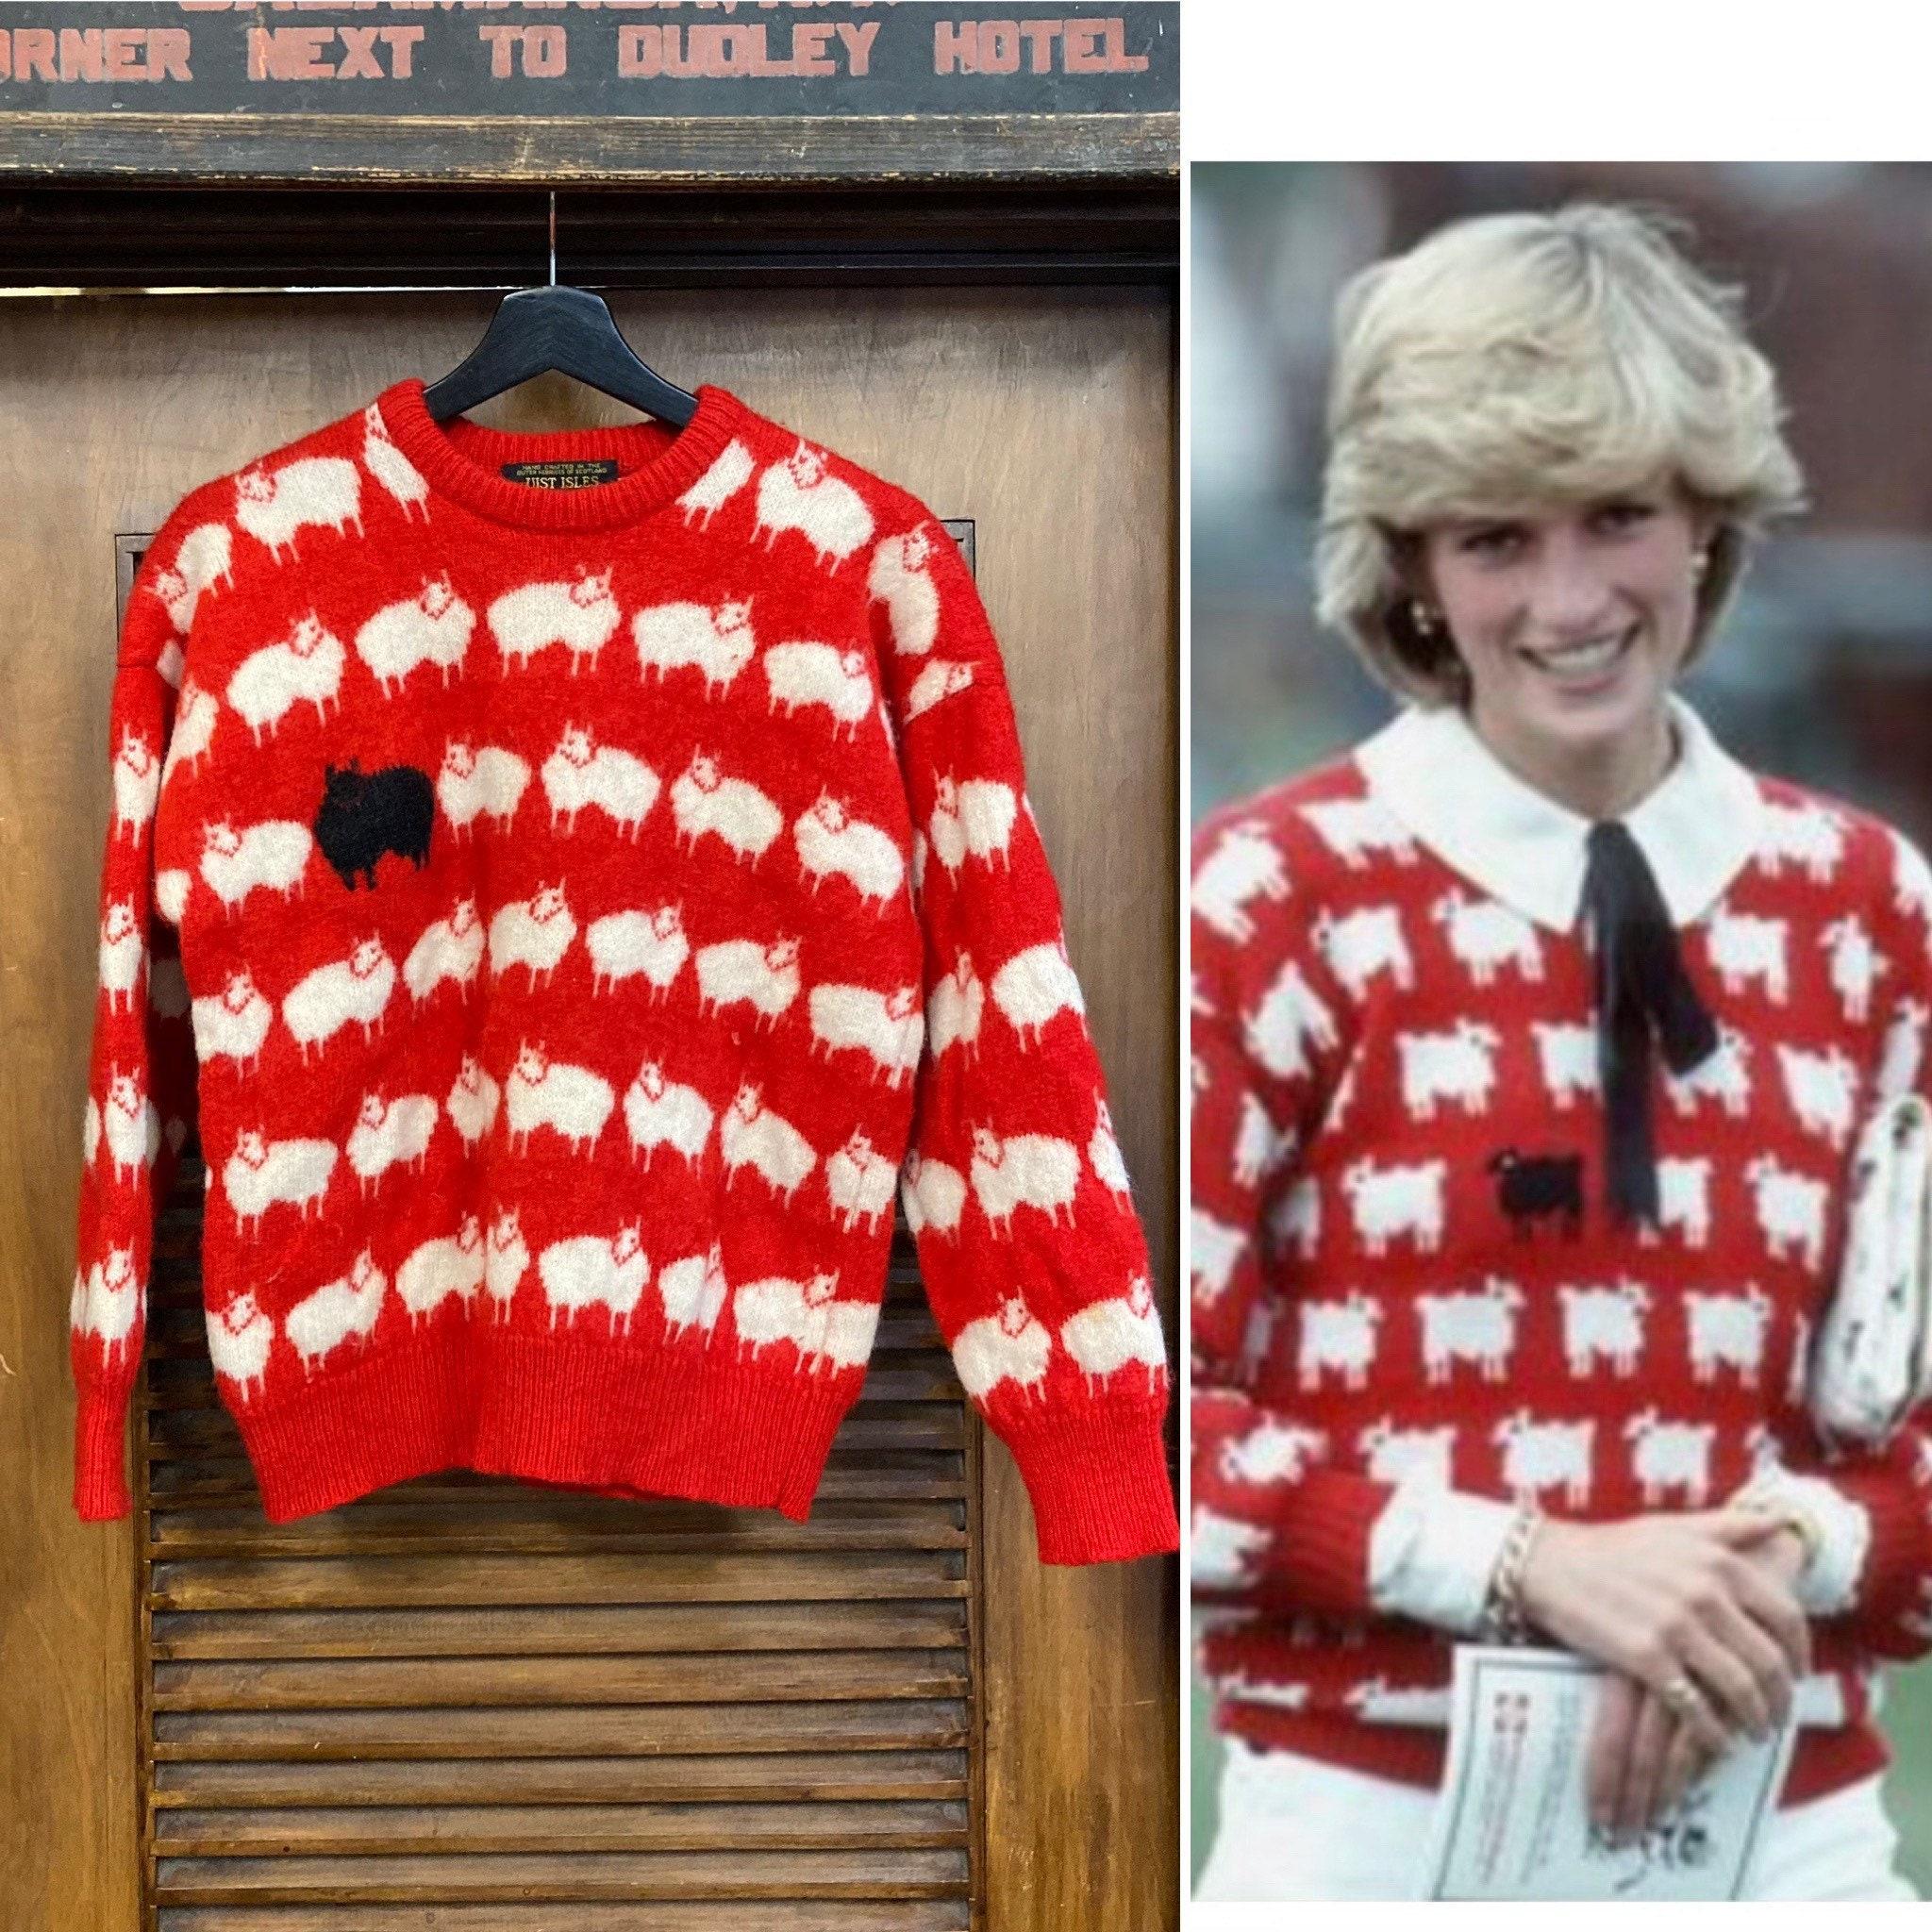 80s Sweatshirts, Sweaters, Vests | Women Vintage 1980s Black Sheep Design Princess Diana Scotland Wool Sweater, 80s New Wave, Pullover Clothing $350.00 AT vintagedancer.com